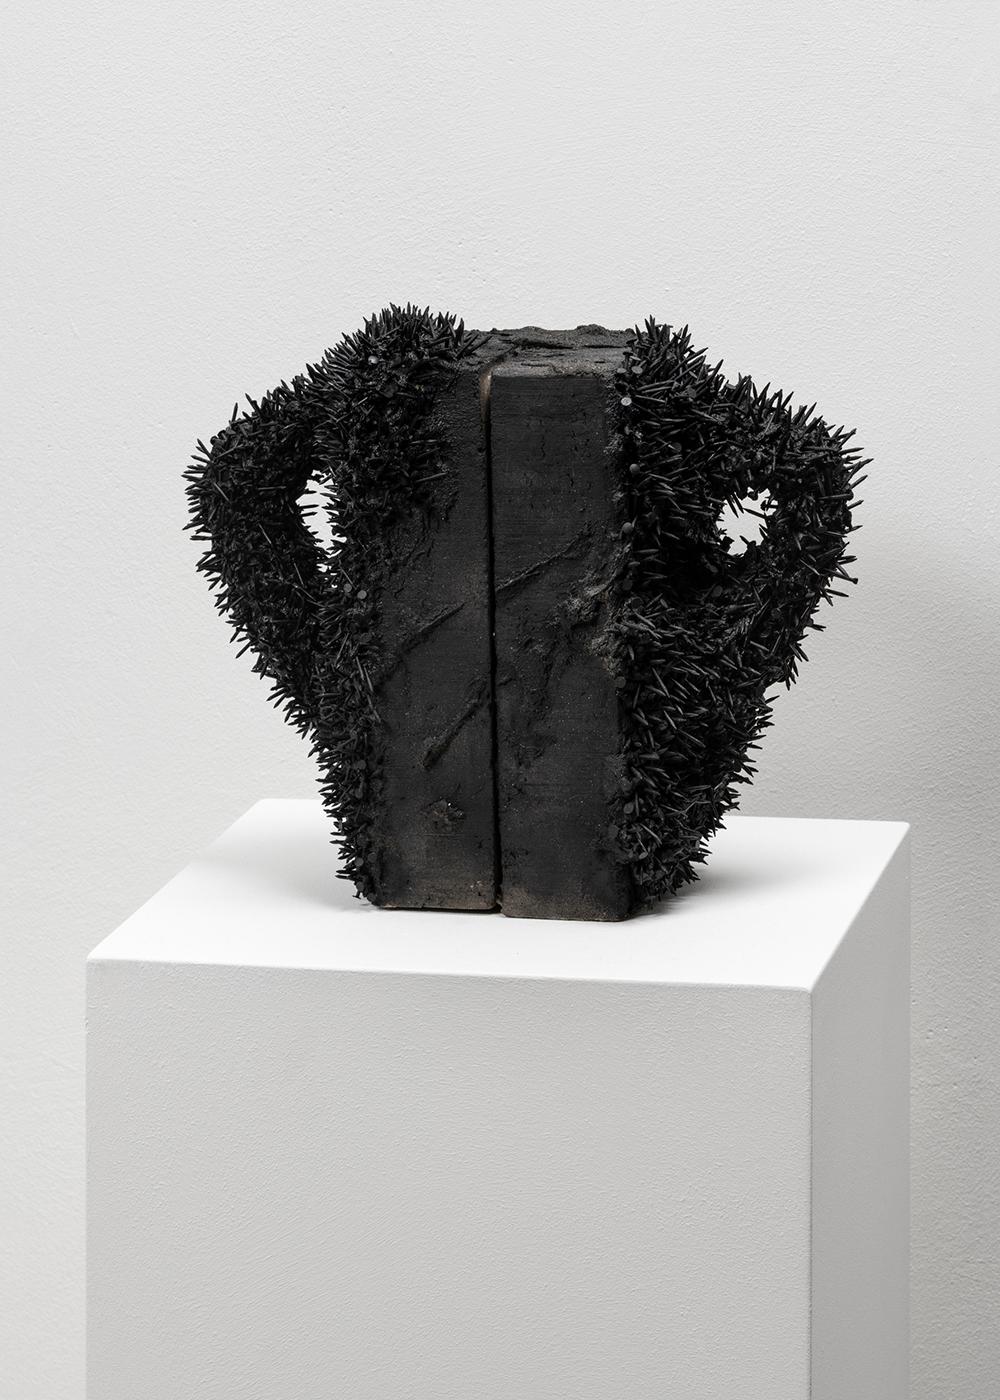 Valerie Collart, Amphorae. Photo: David Stjernholm.